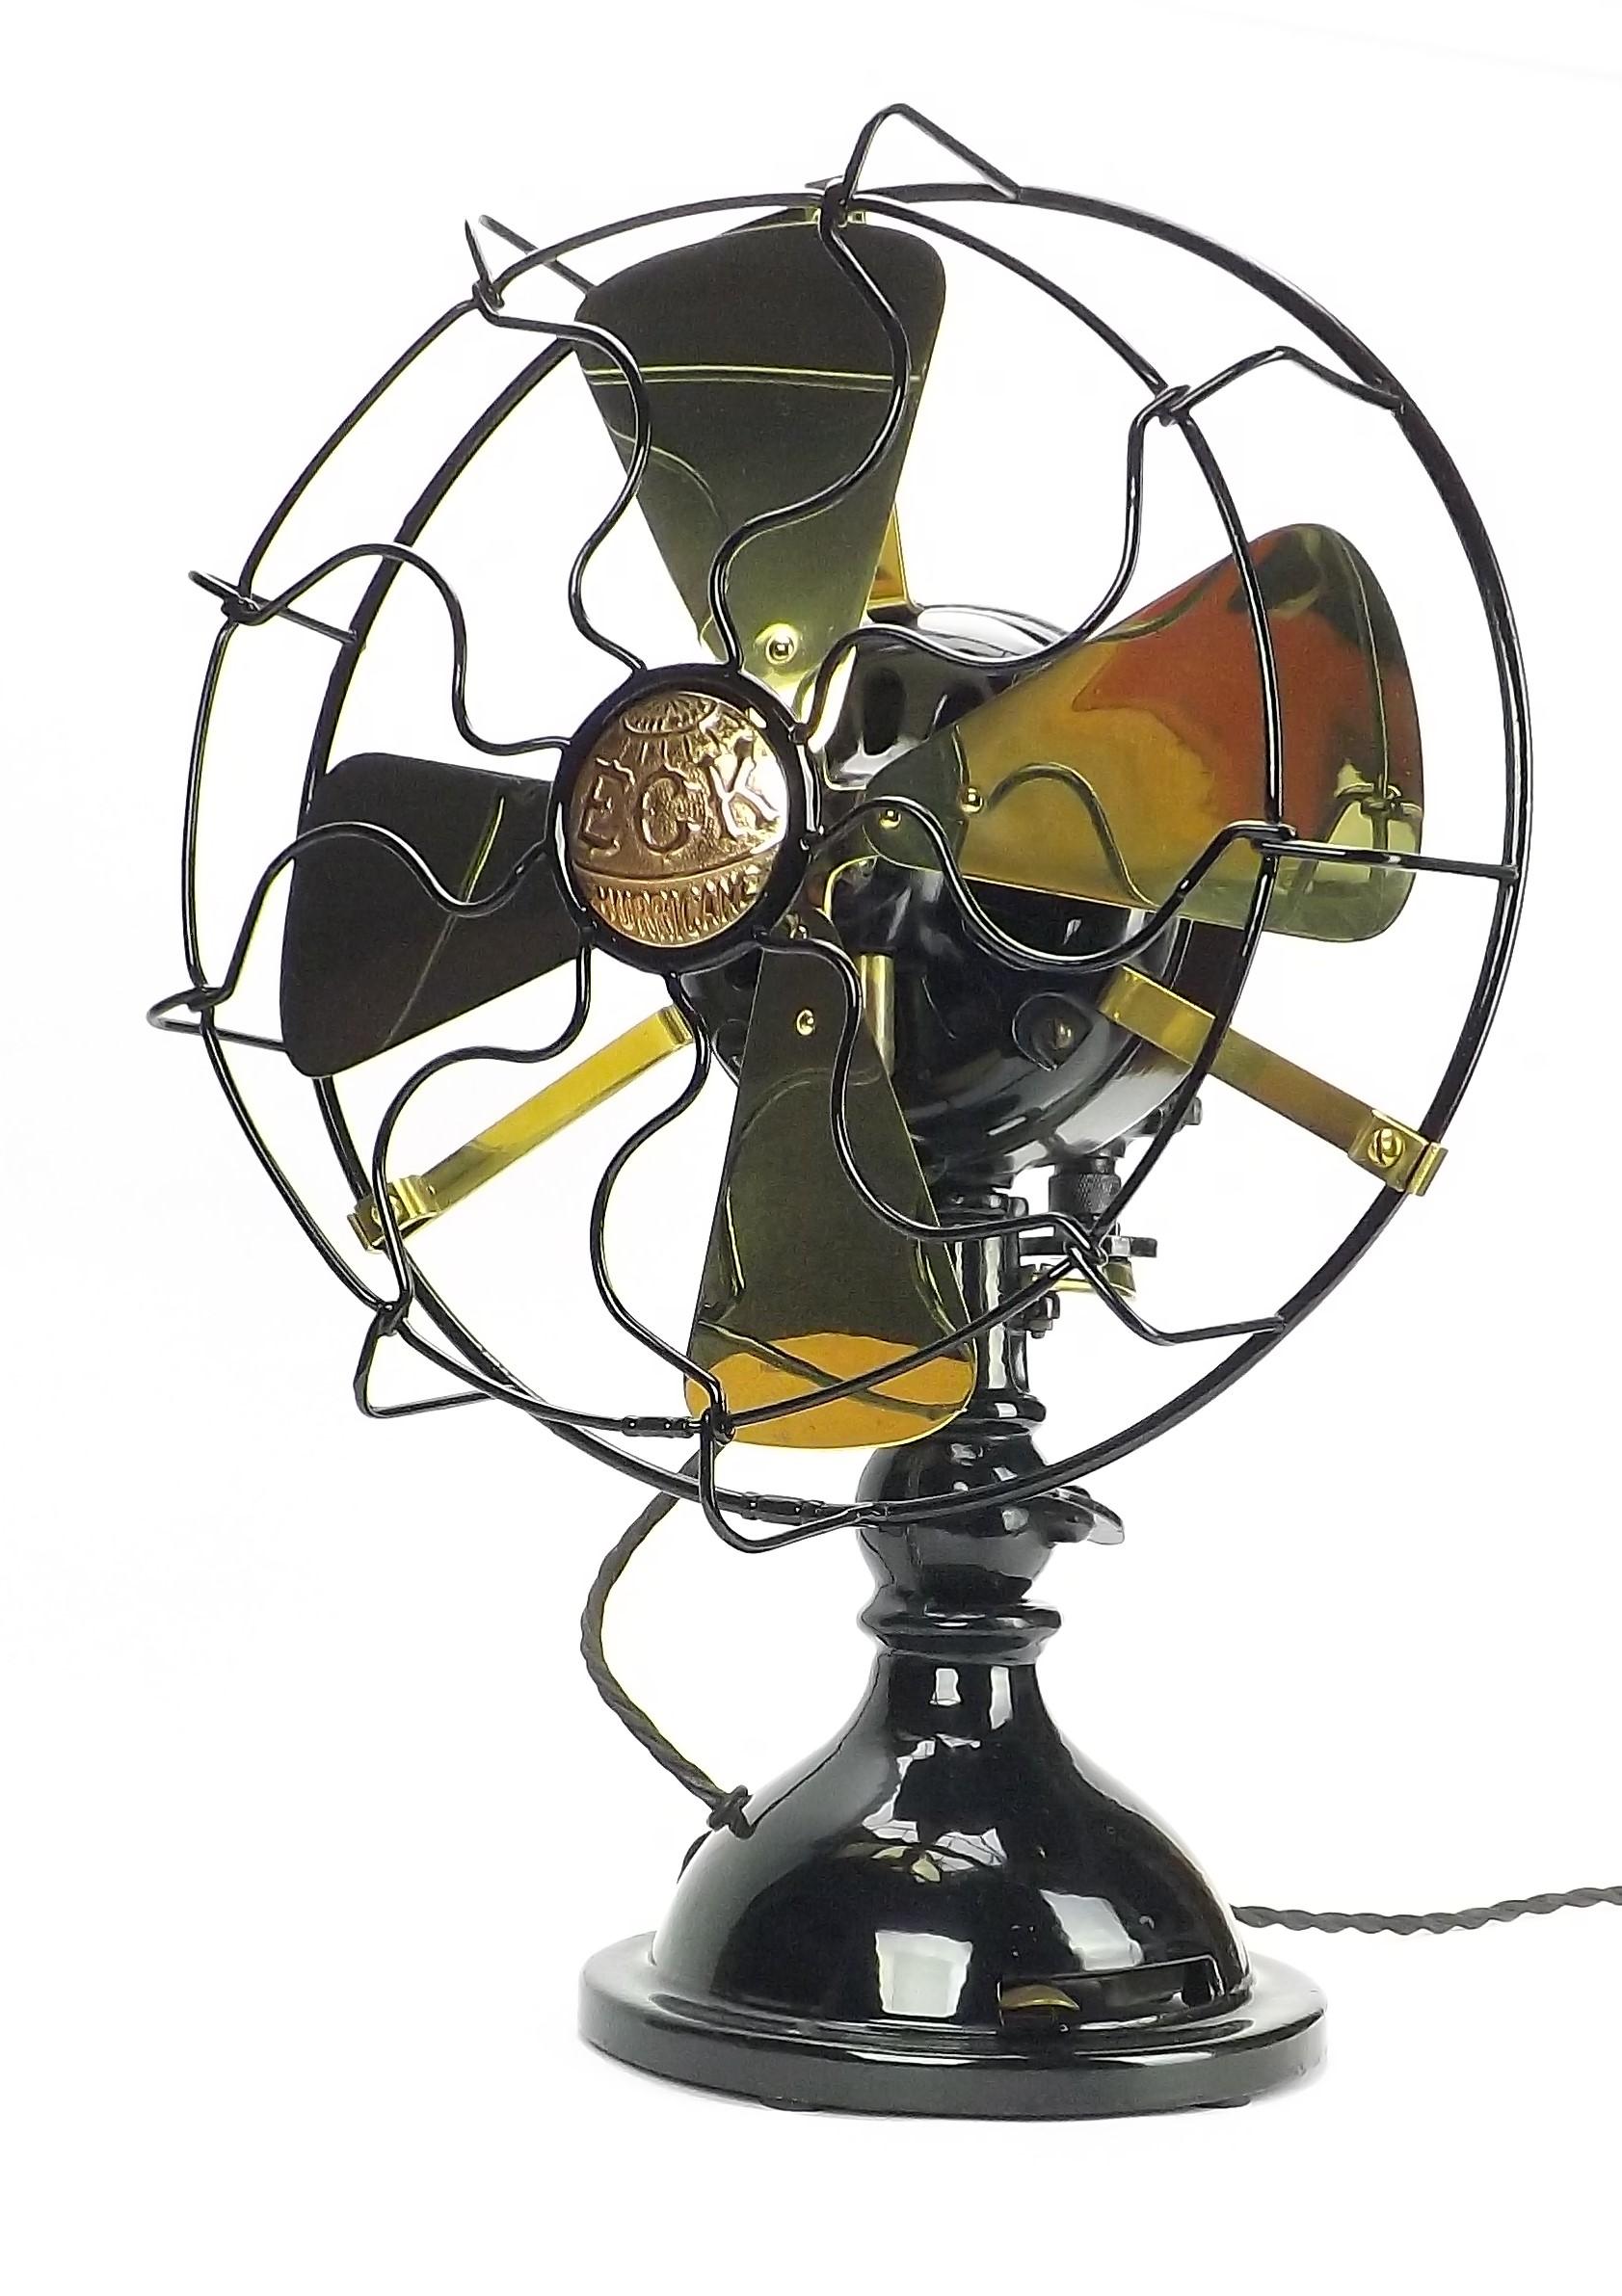 "Circa 1915 12"" ECK Toilet Bowl Oscillating Desk Fan"